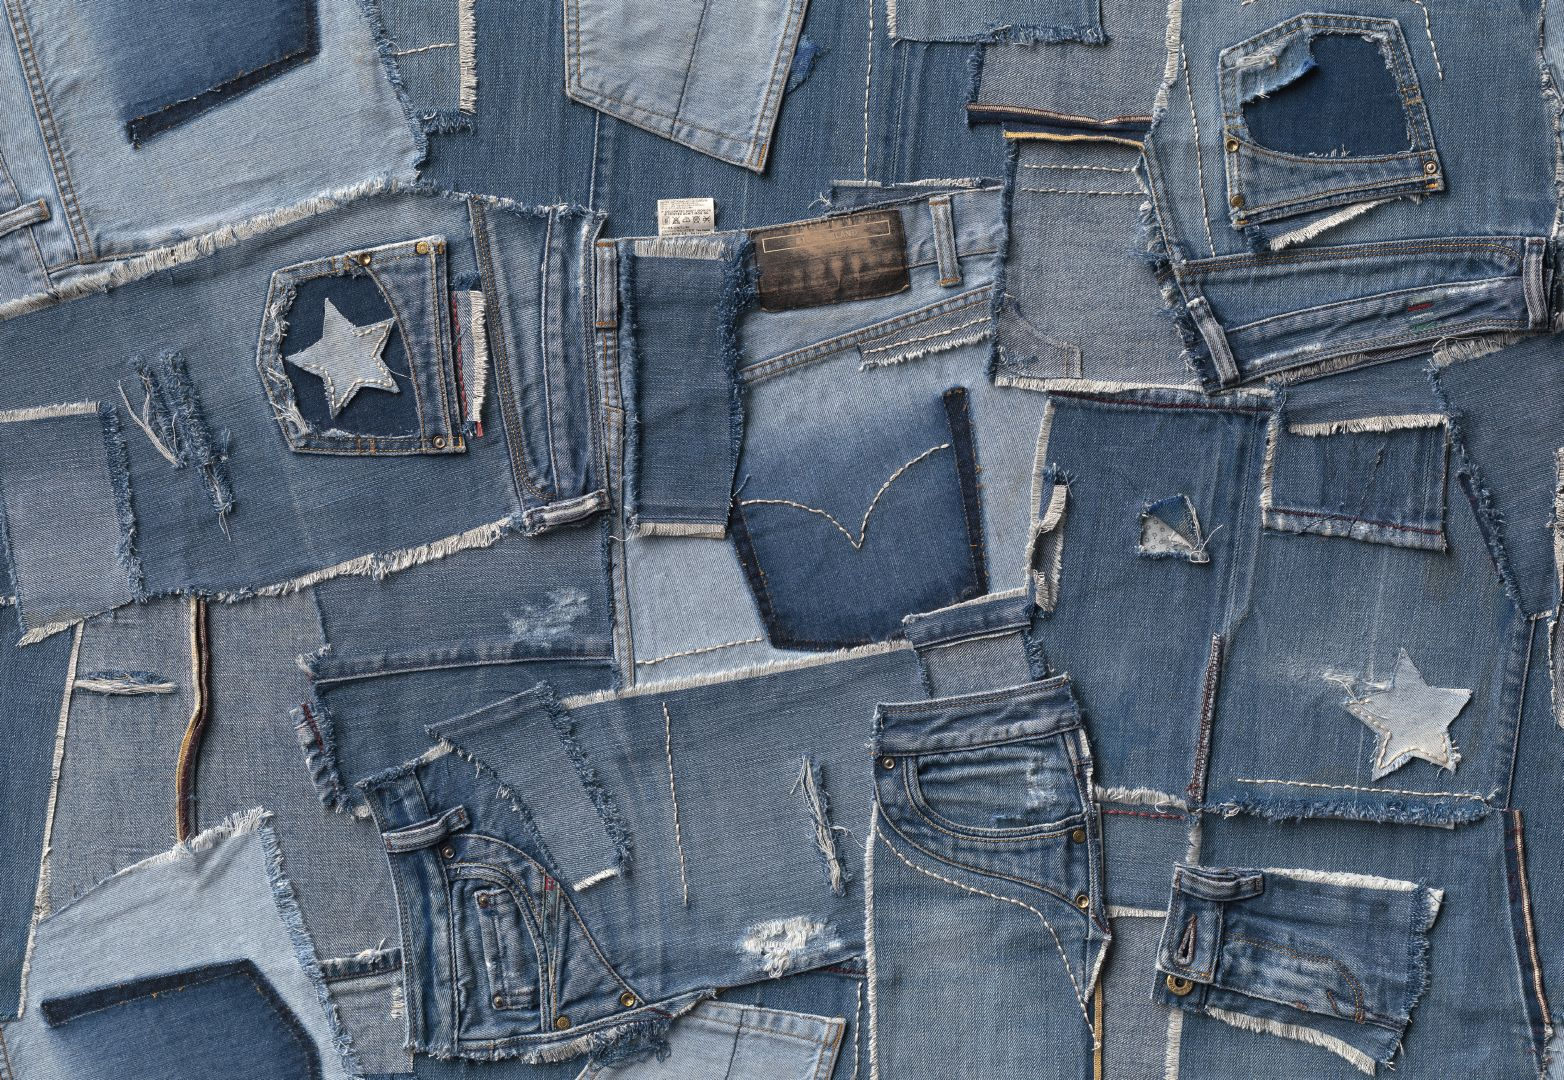 Fototapeta na zeď Jeans 8-909 (8-dílná fototapeta)